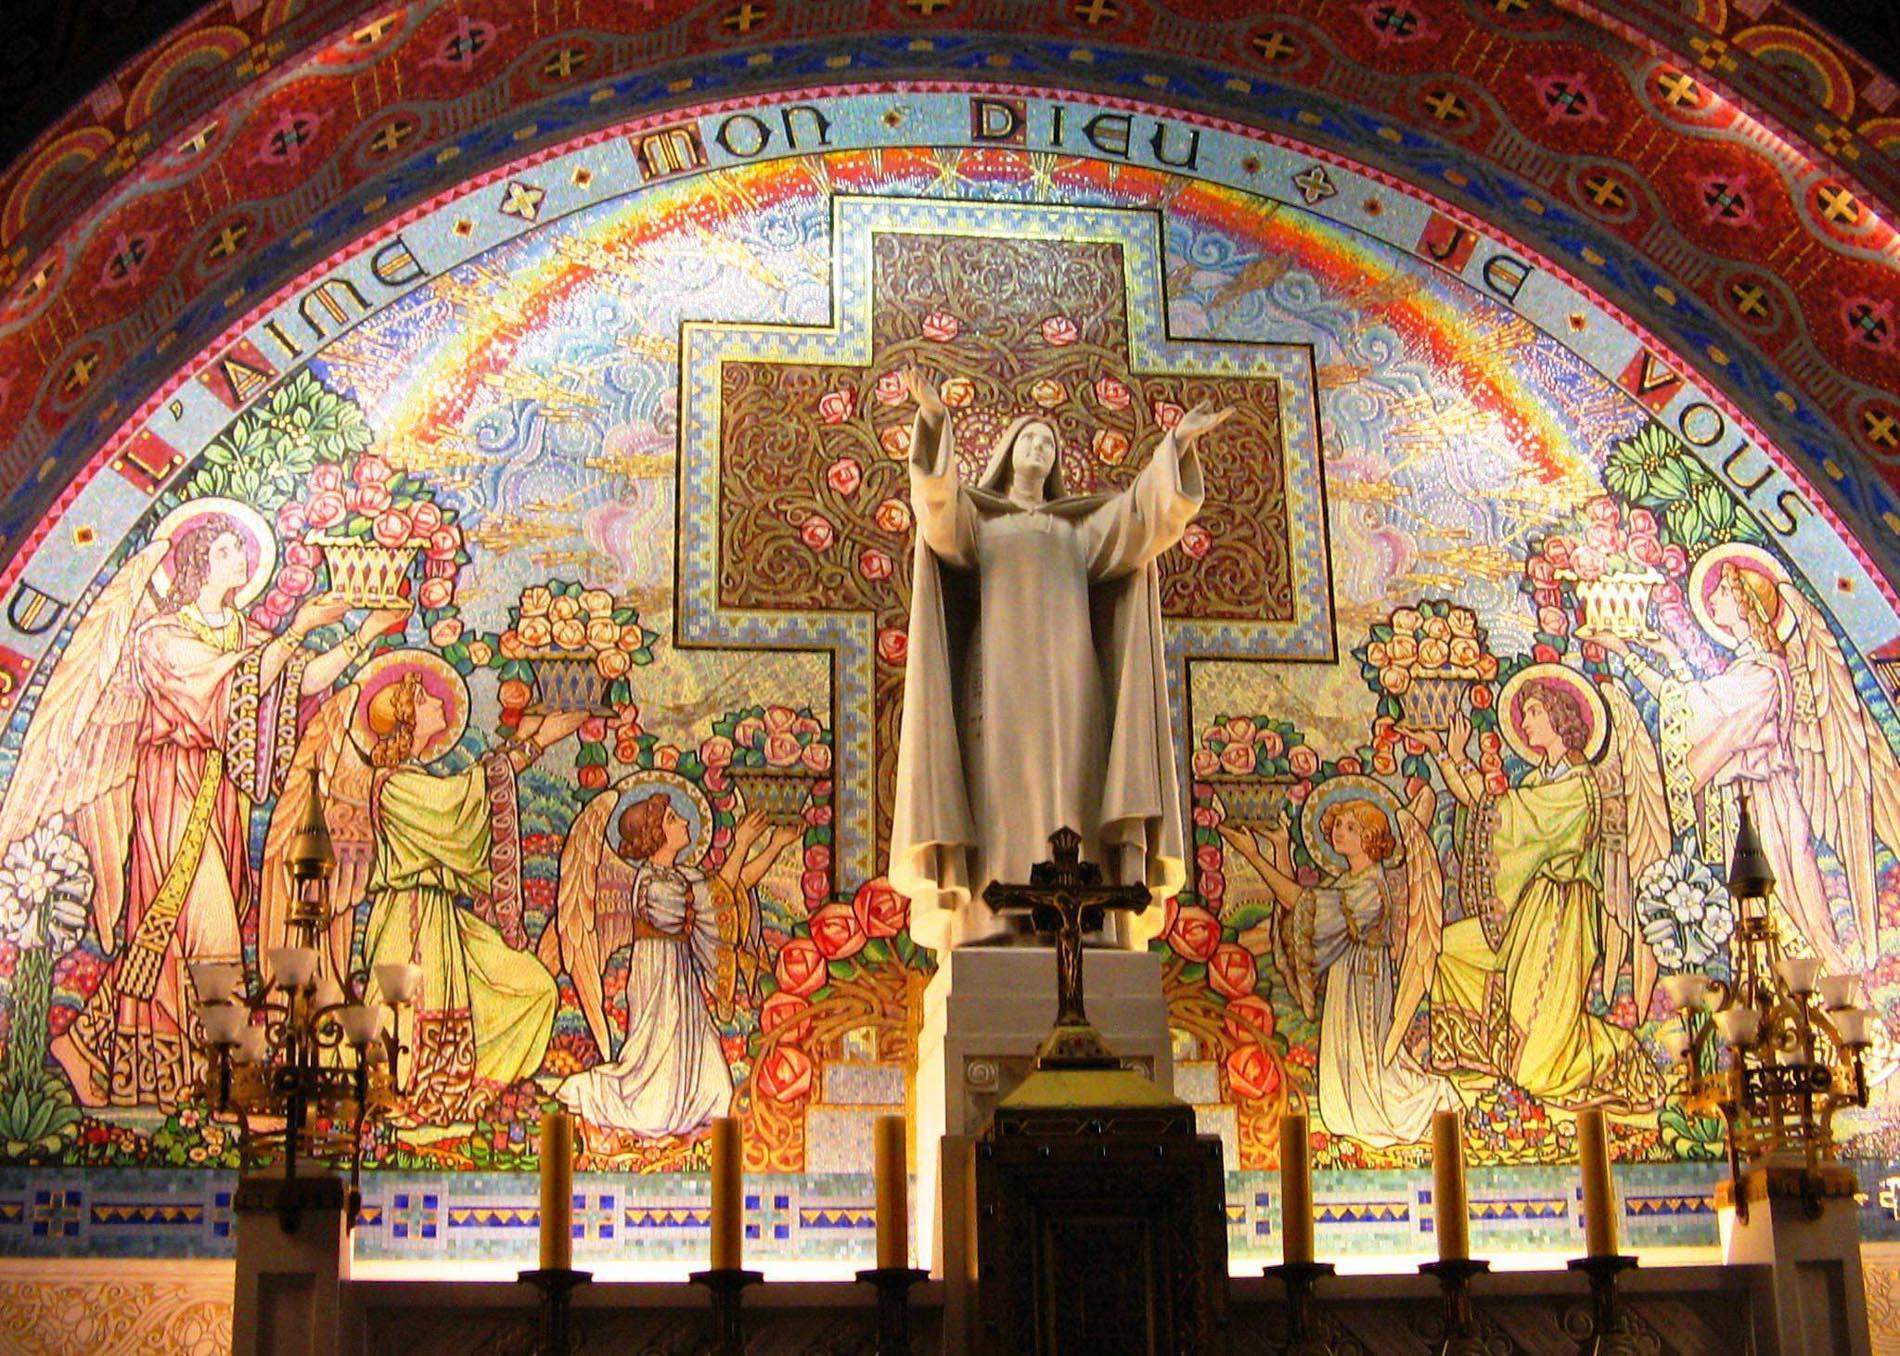 cyril of jerusalem - the catholic church